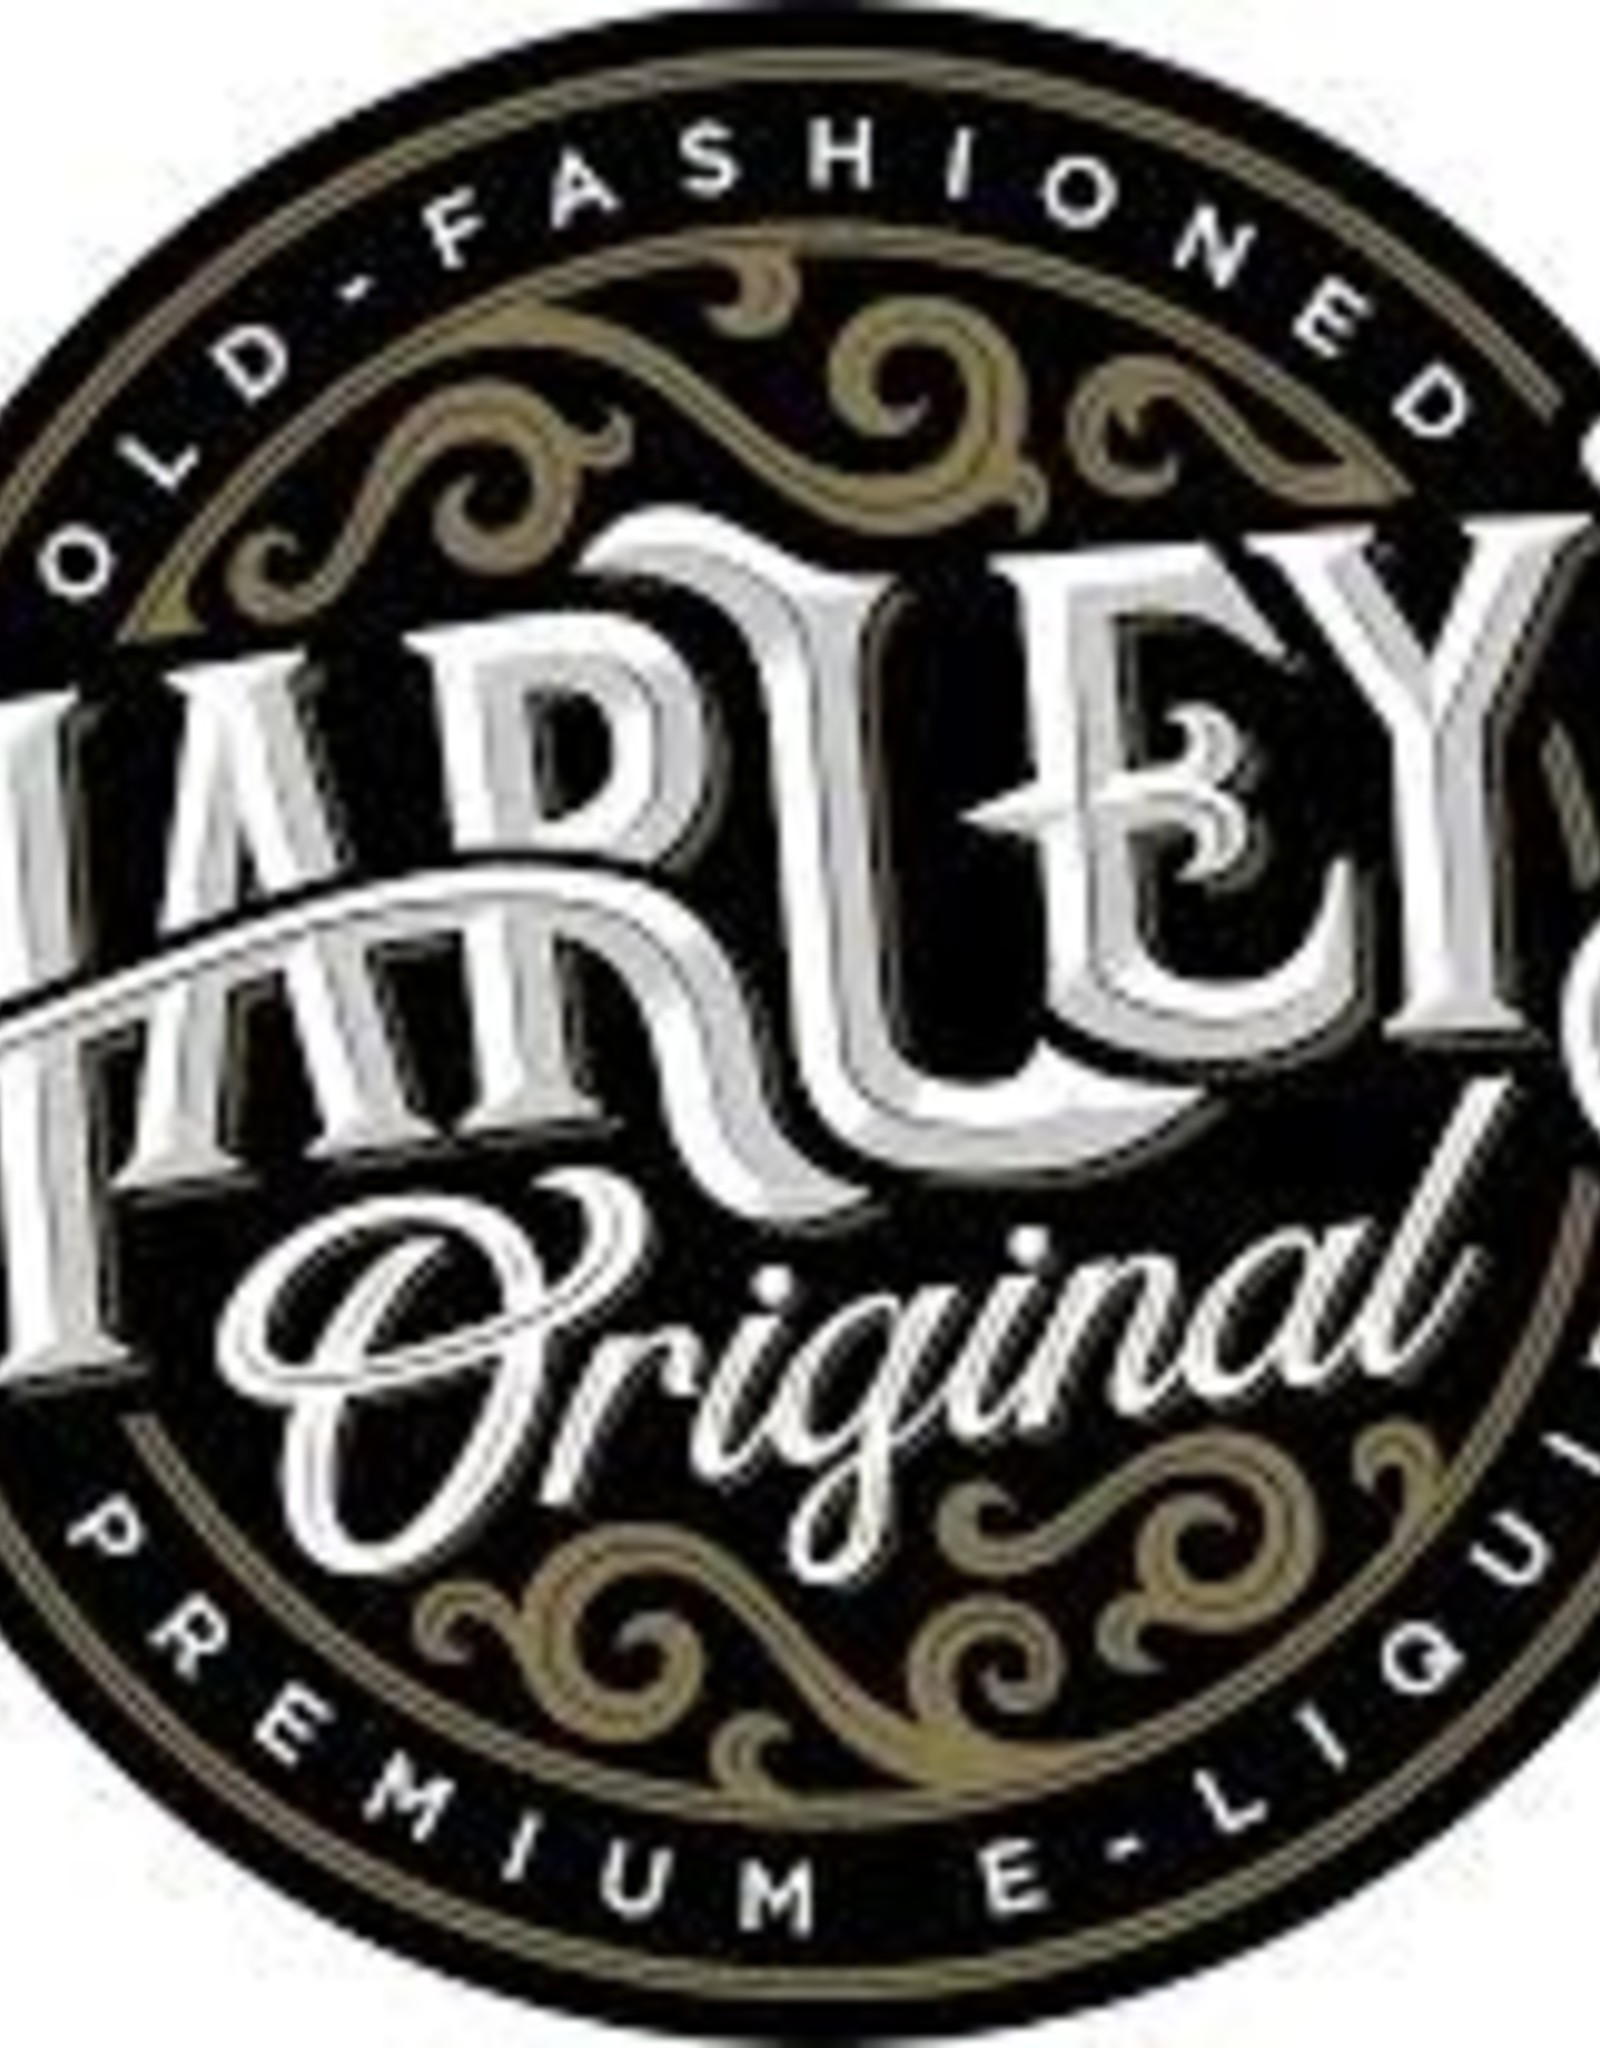 Harley's Harley's Original